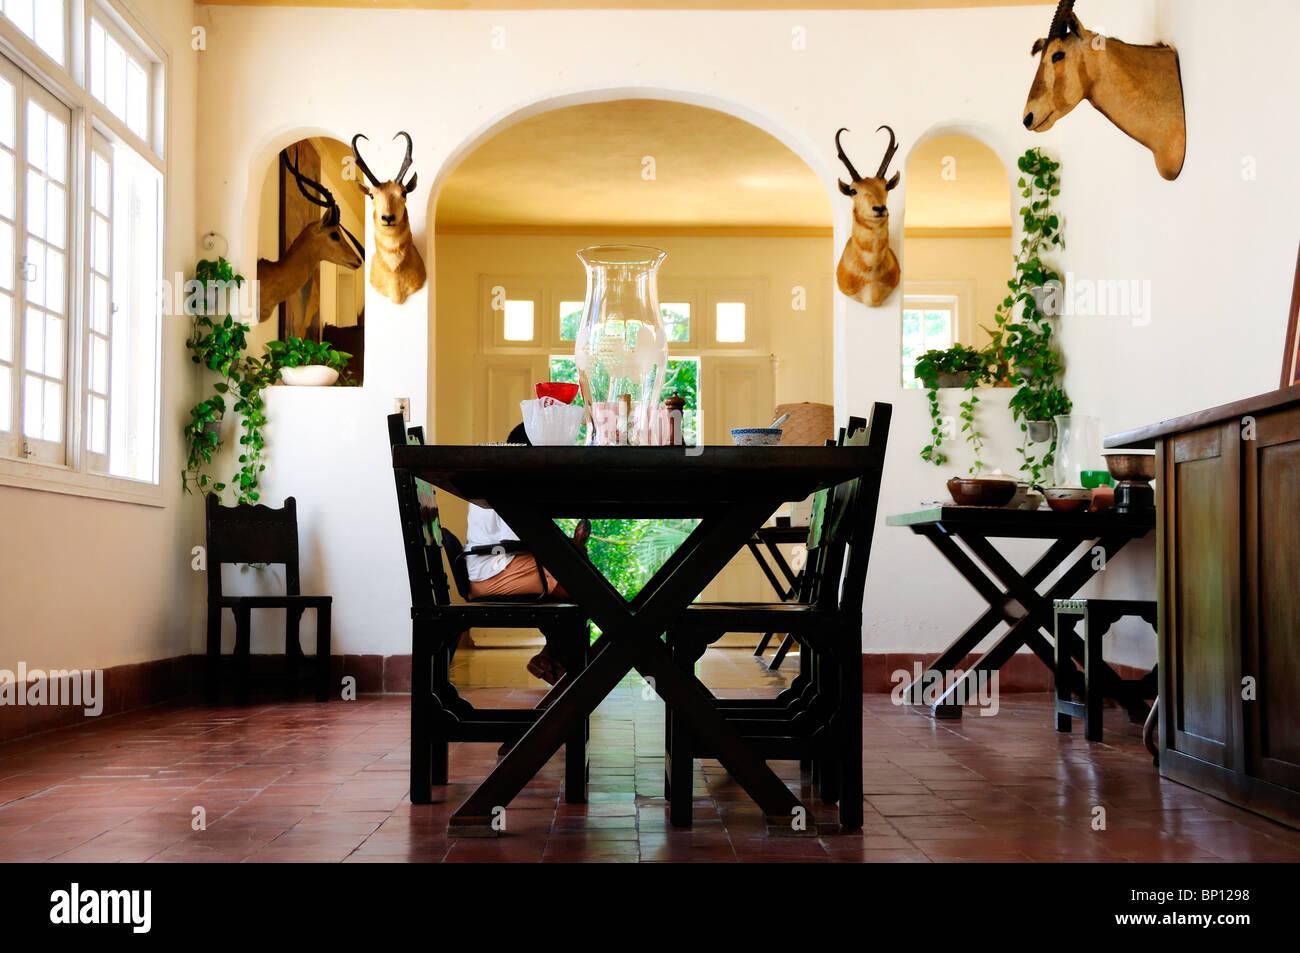 Detail from Ernest Hemingway´s dining room at Finca Vigia in San Francisco de Paula, Cuba. Stock Photo